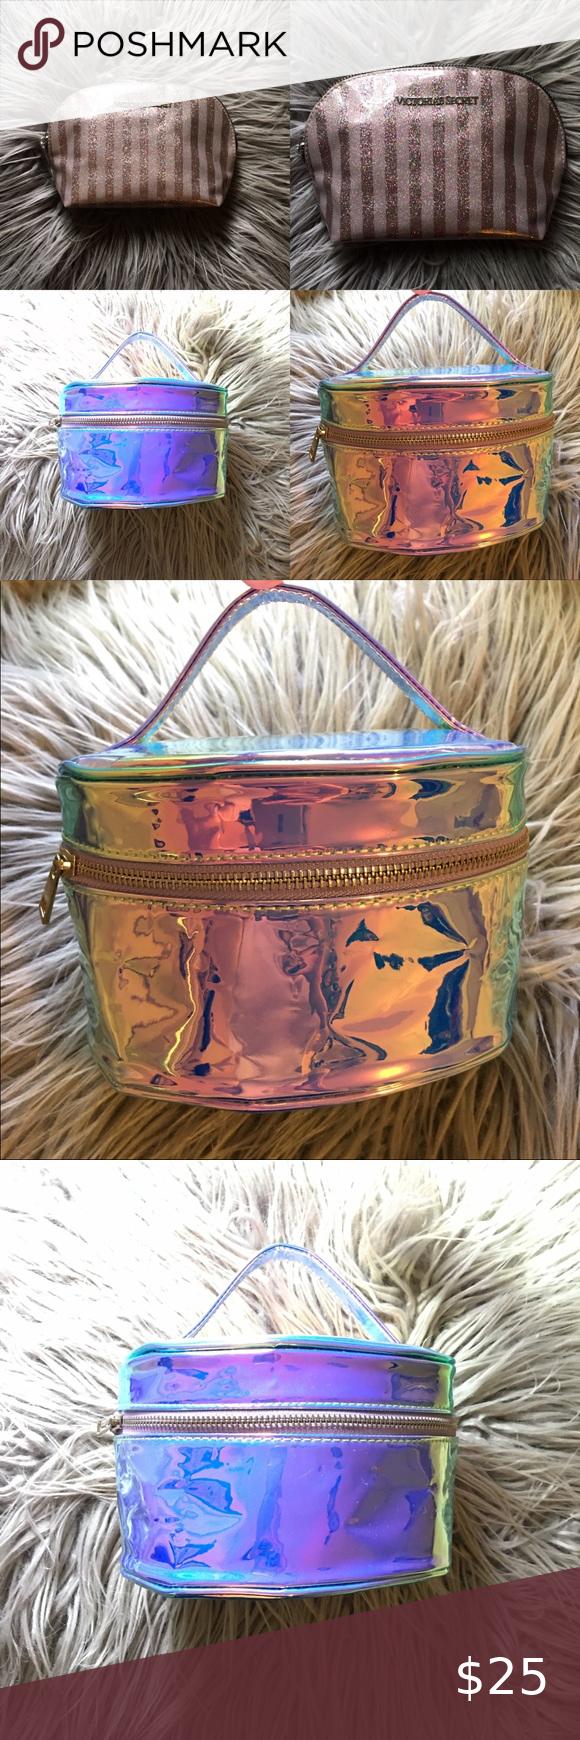 2 medium glitter shiny fluorescence makeup bags in 2020